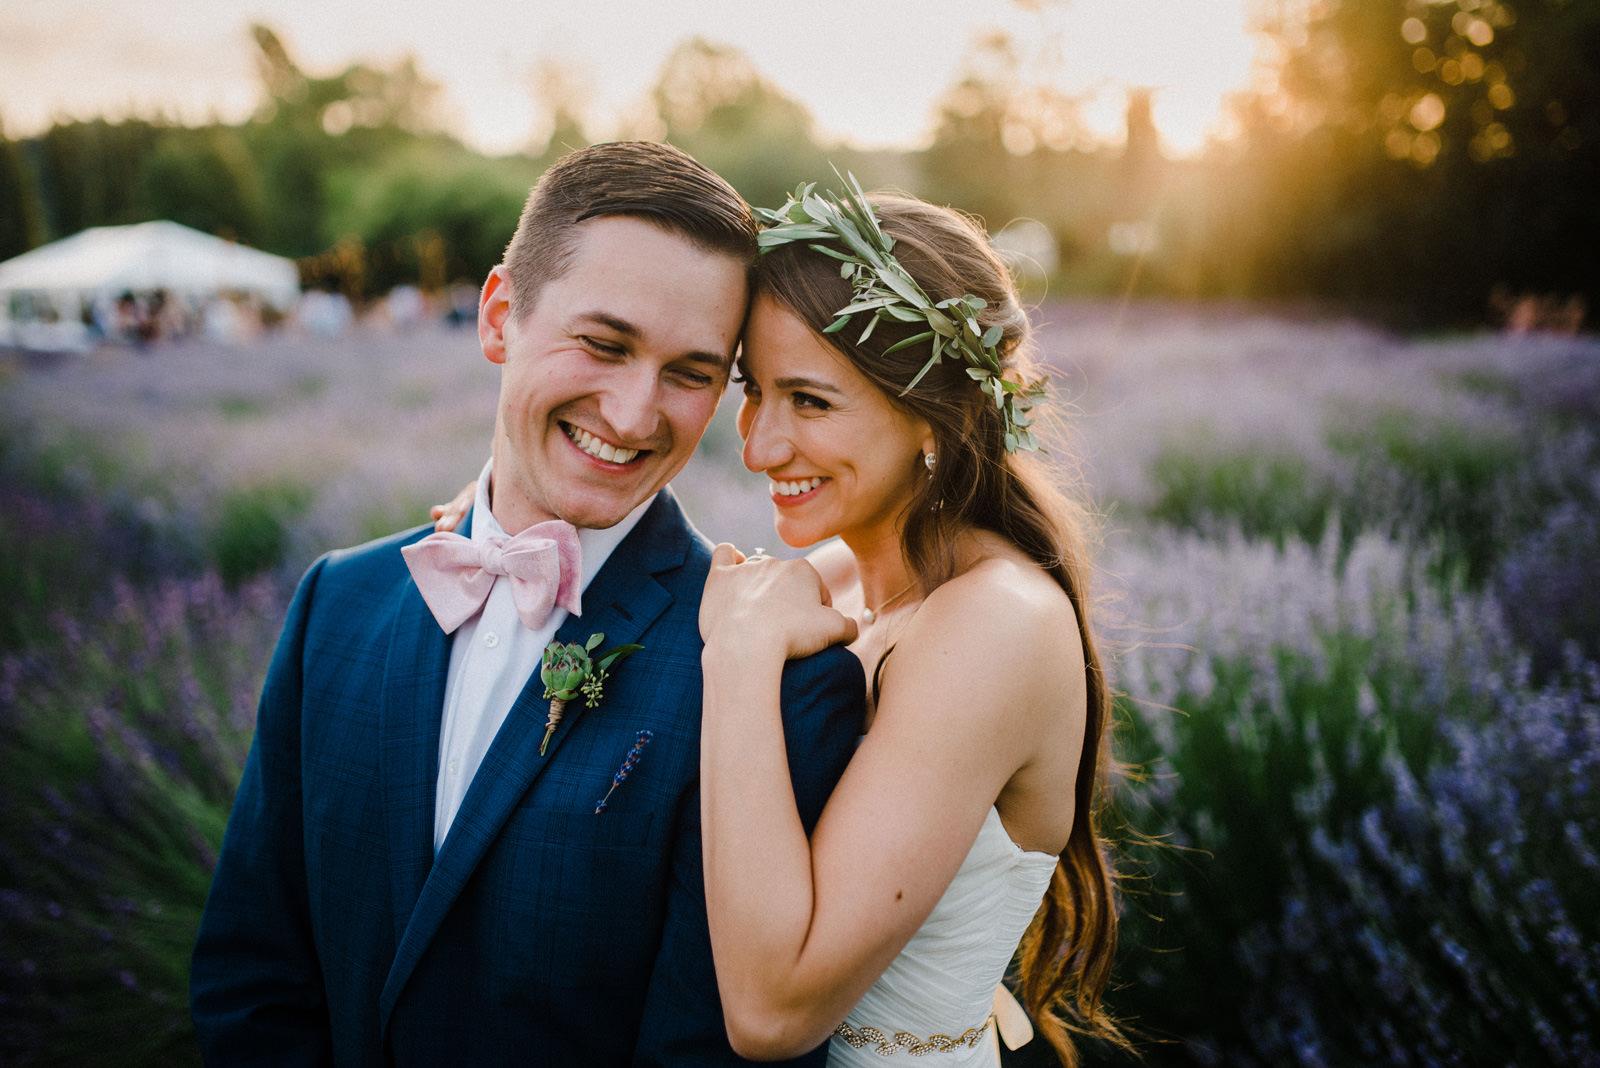 103-woodinville-lavendar-farm-wedding-with-golden-glowy-photos.jpg